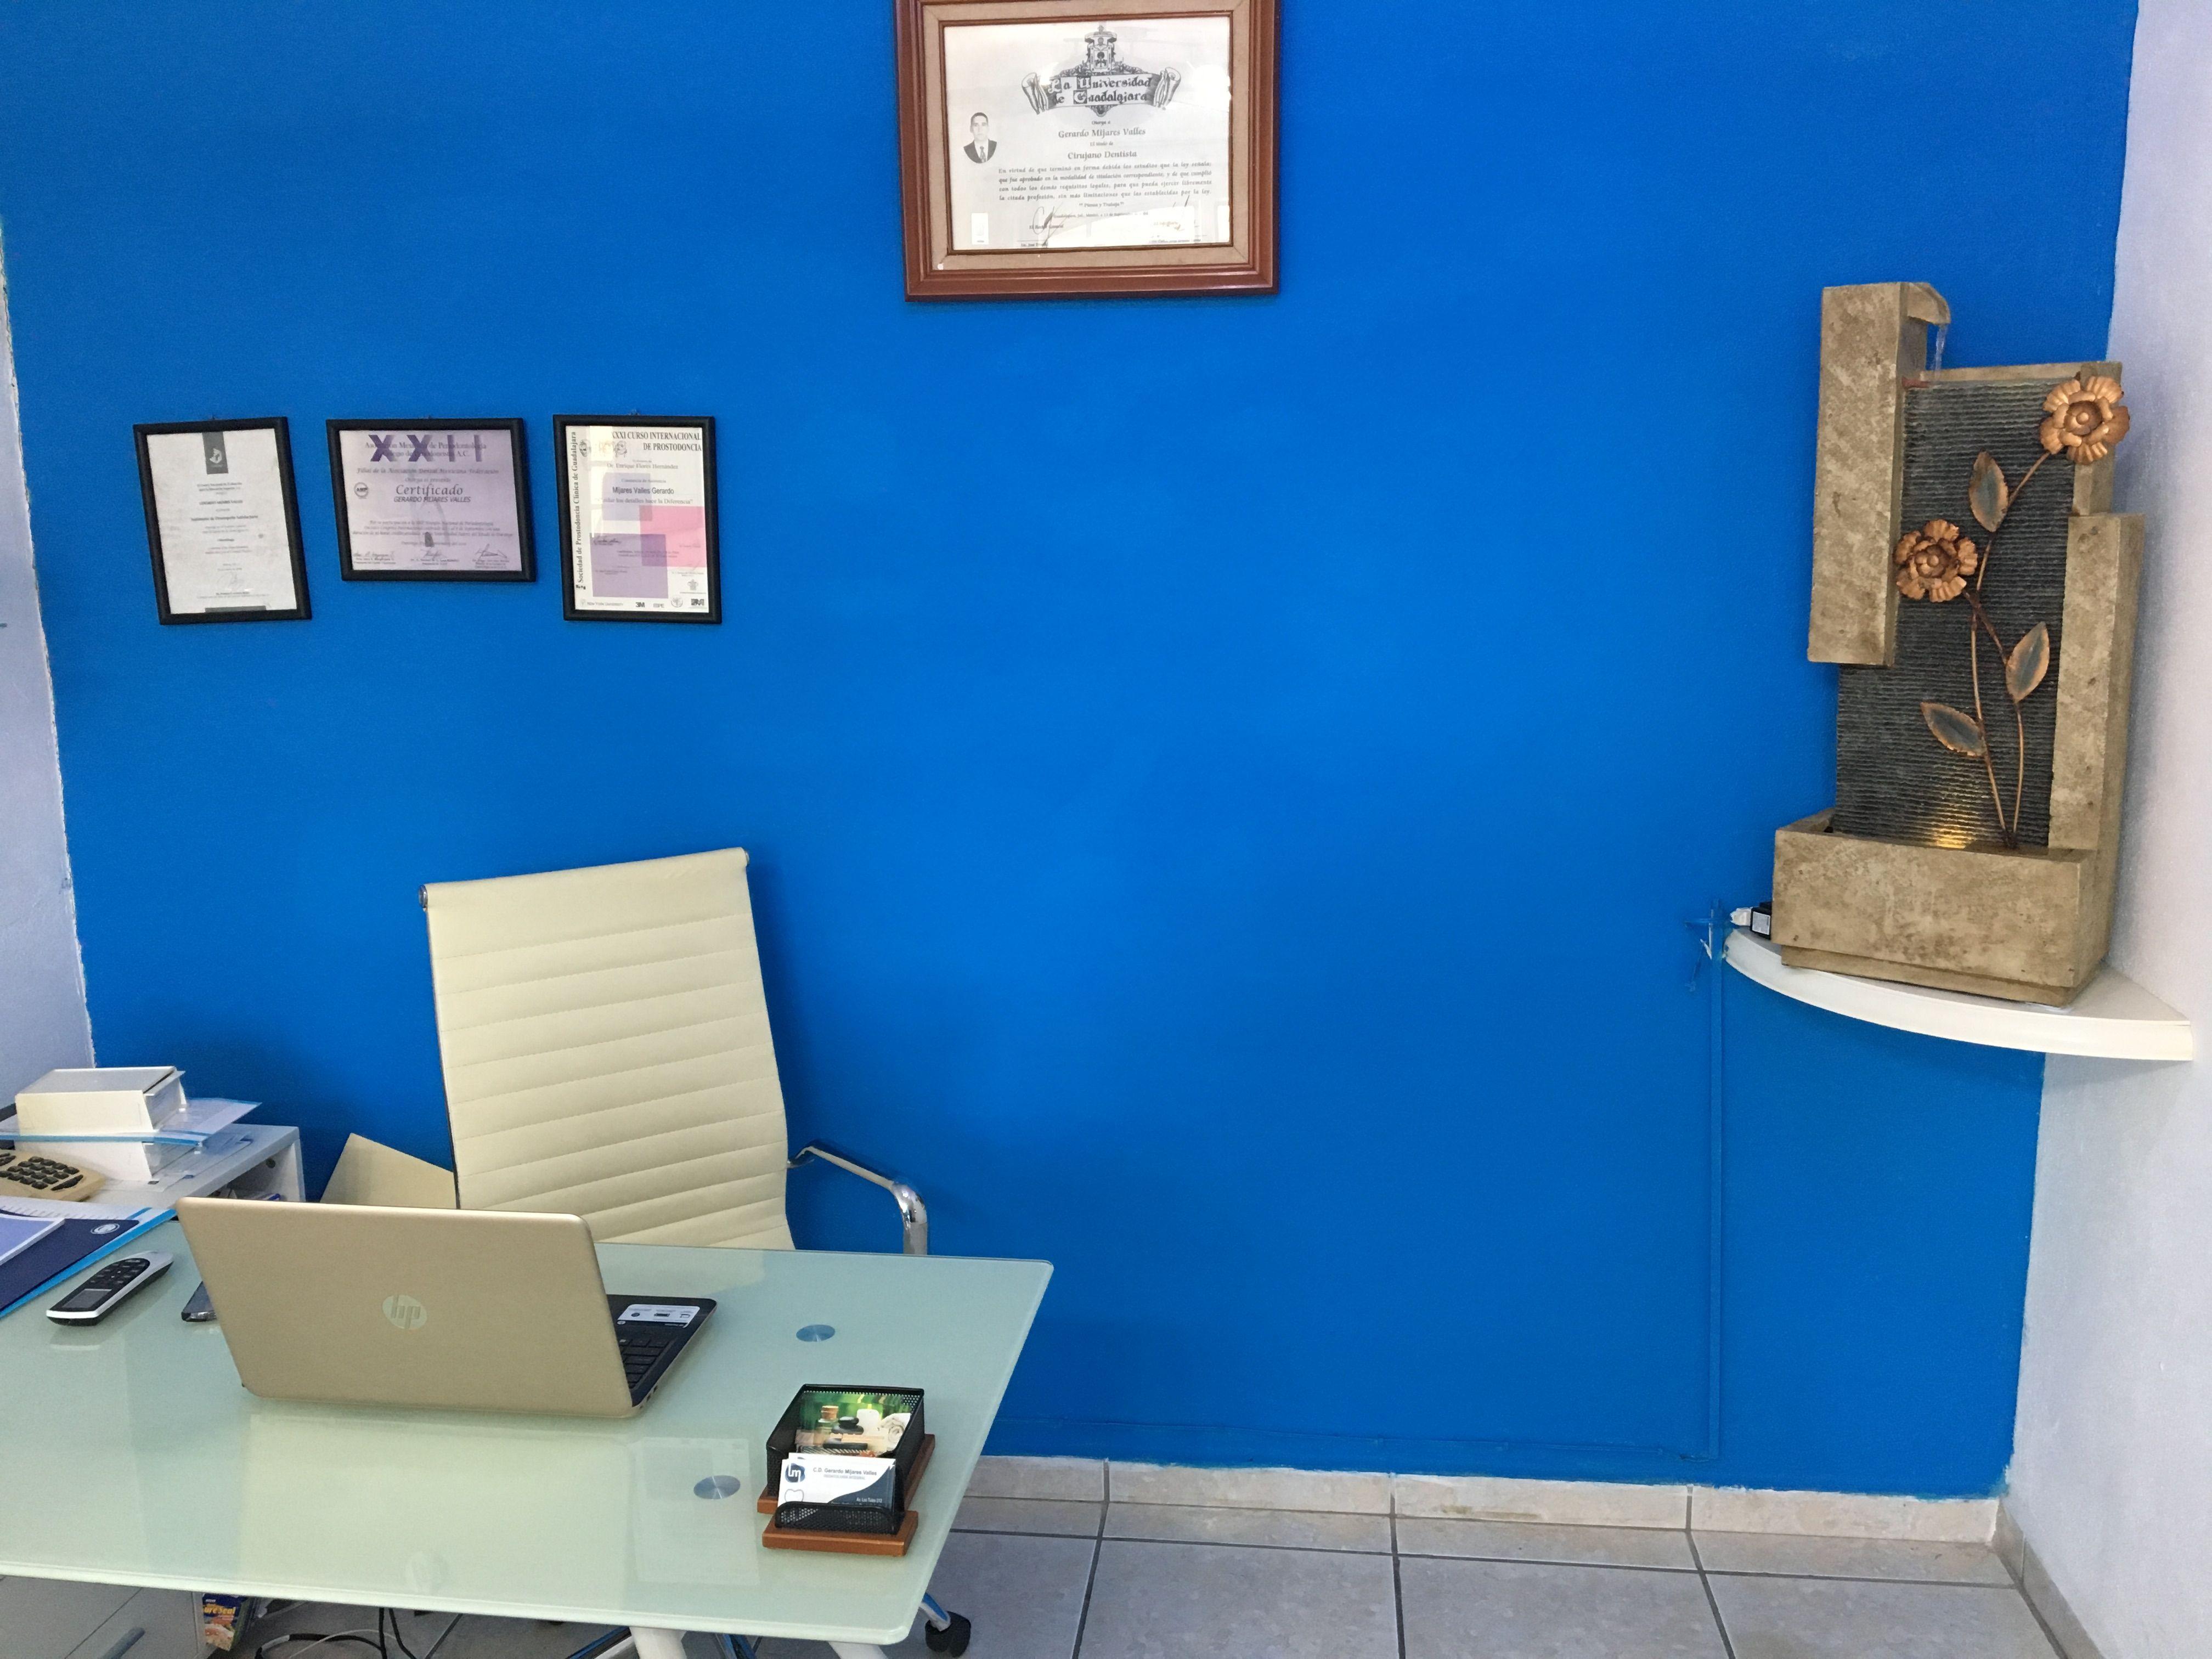 UniMed Especialidades Puerto Vallarta